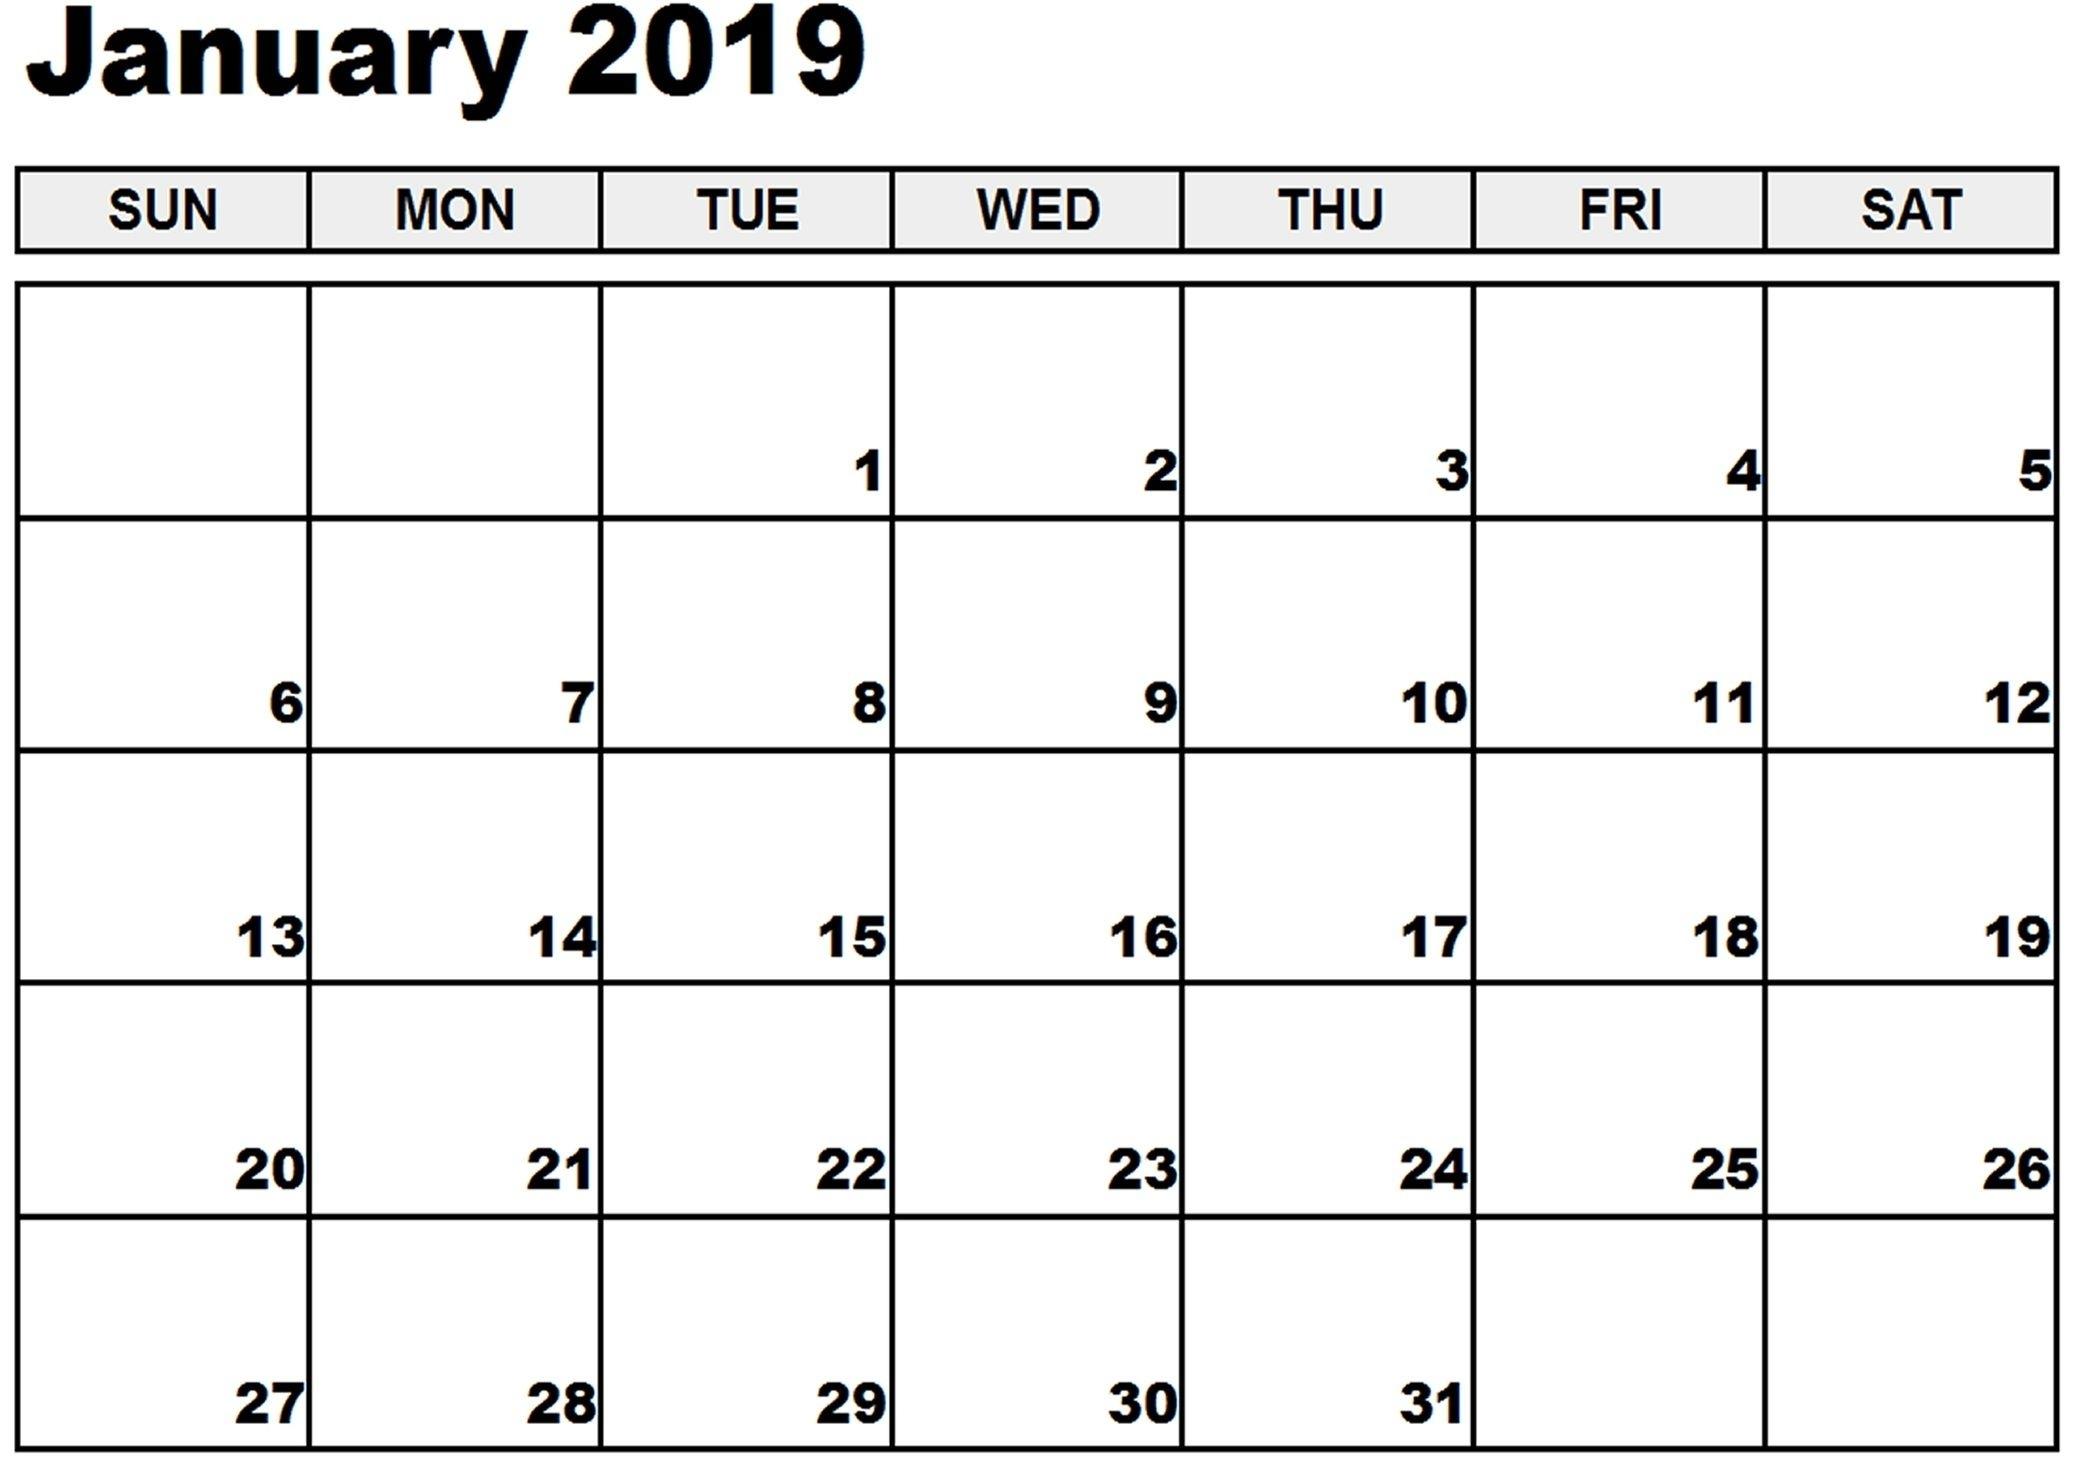 January 2019 Printable Calendar January 2019 Calendar